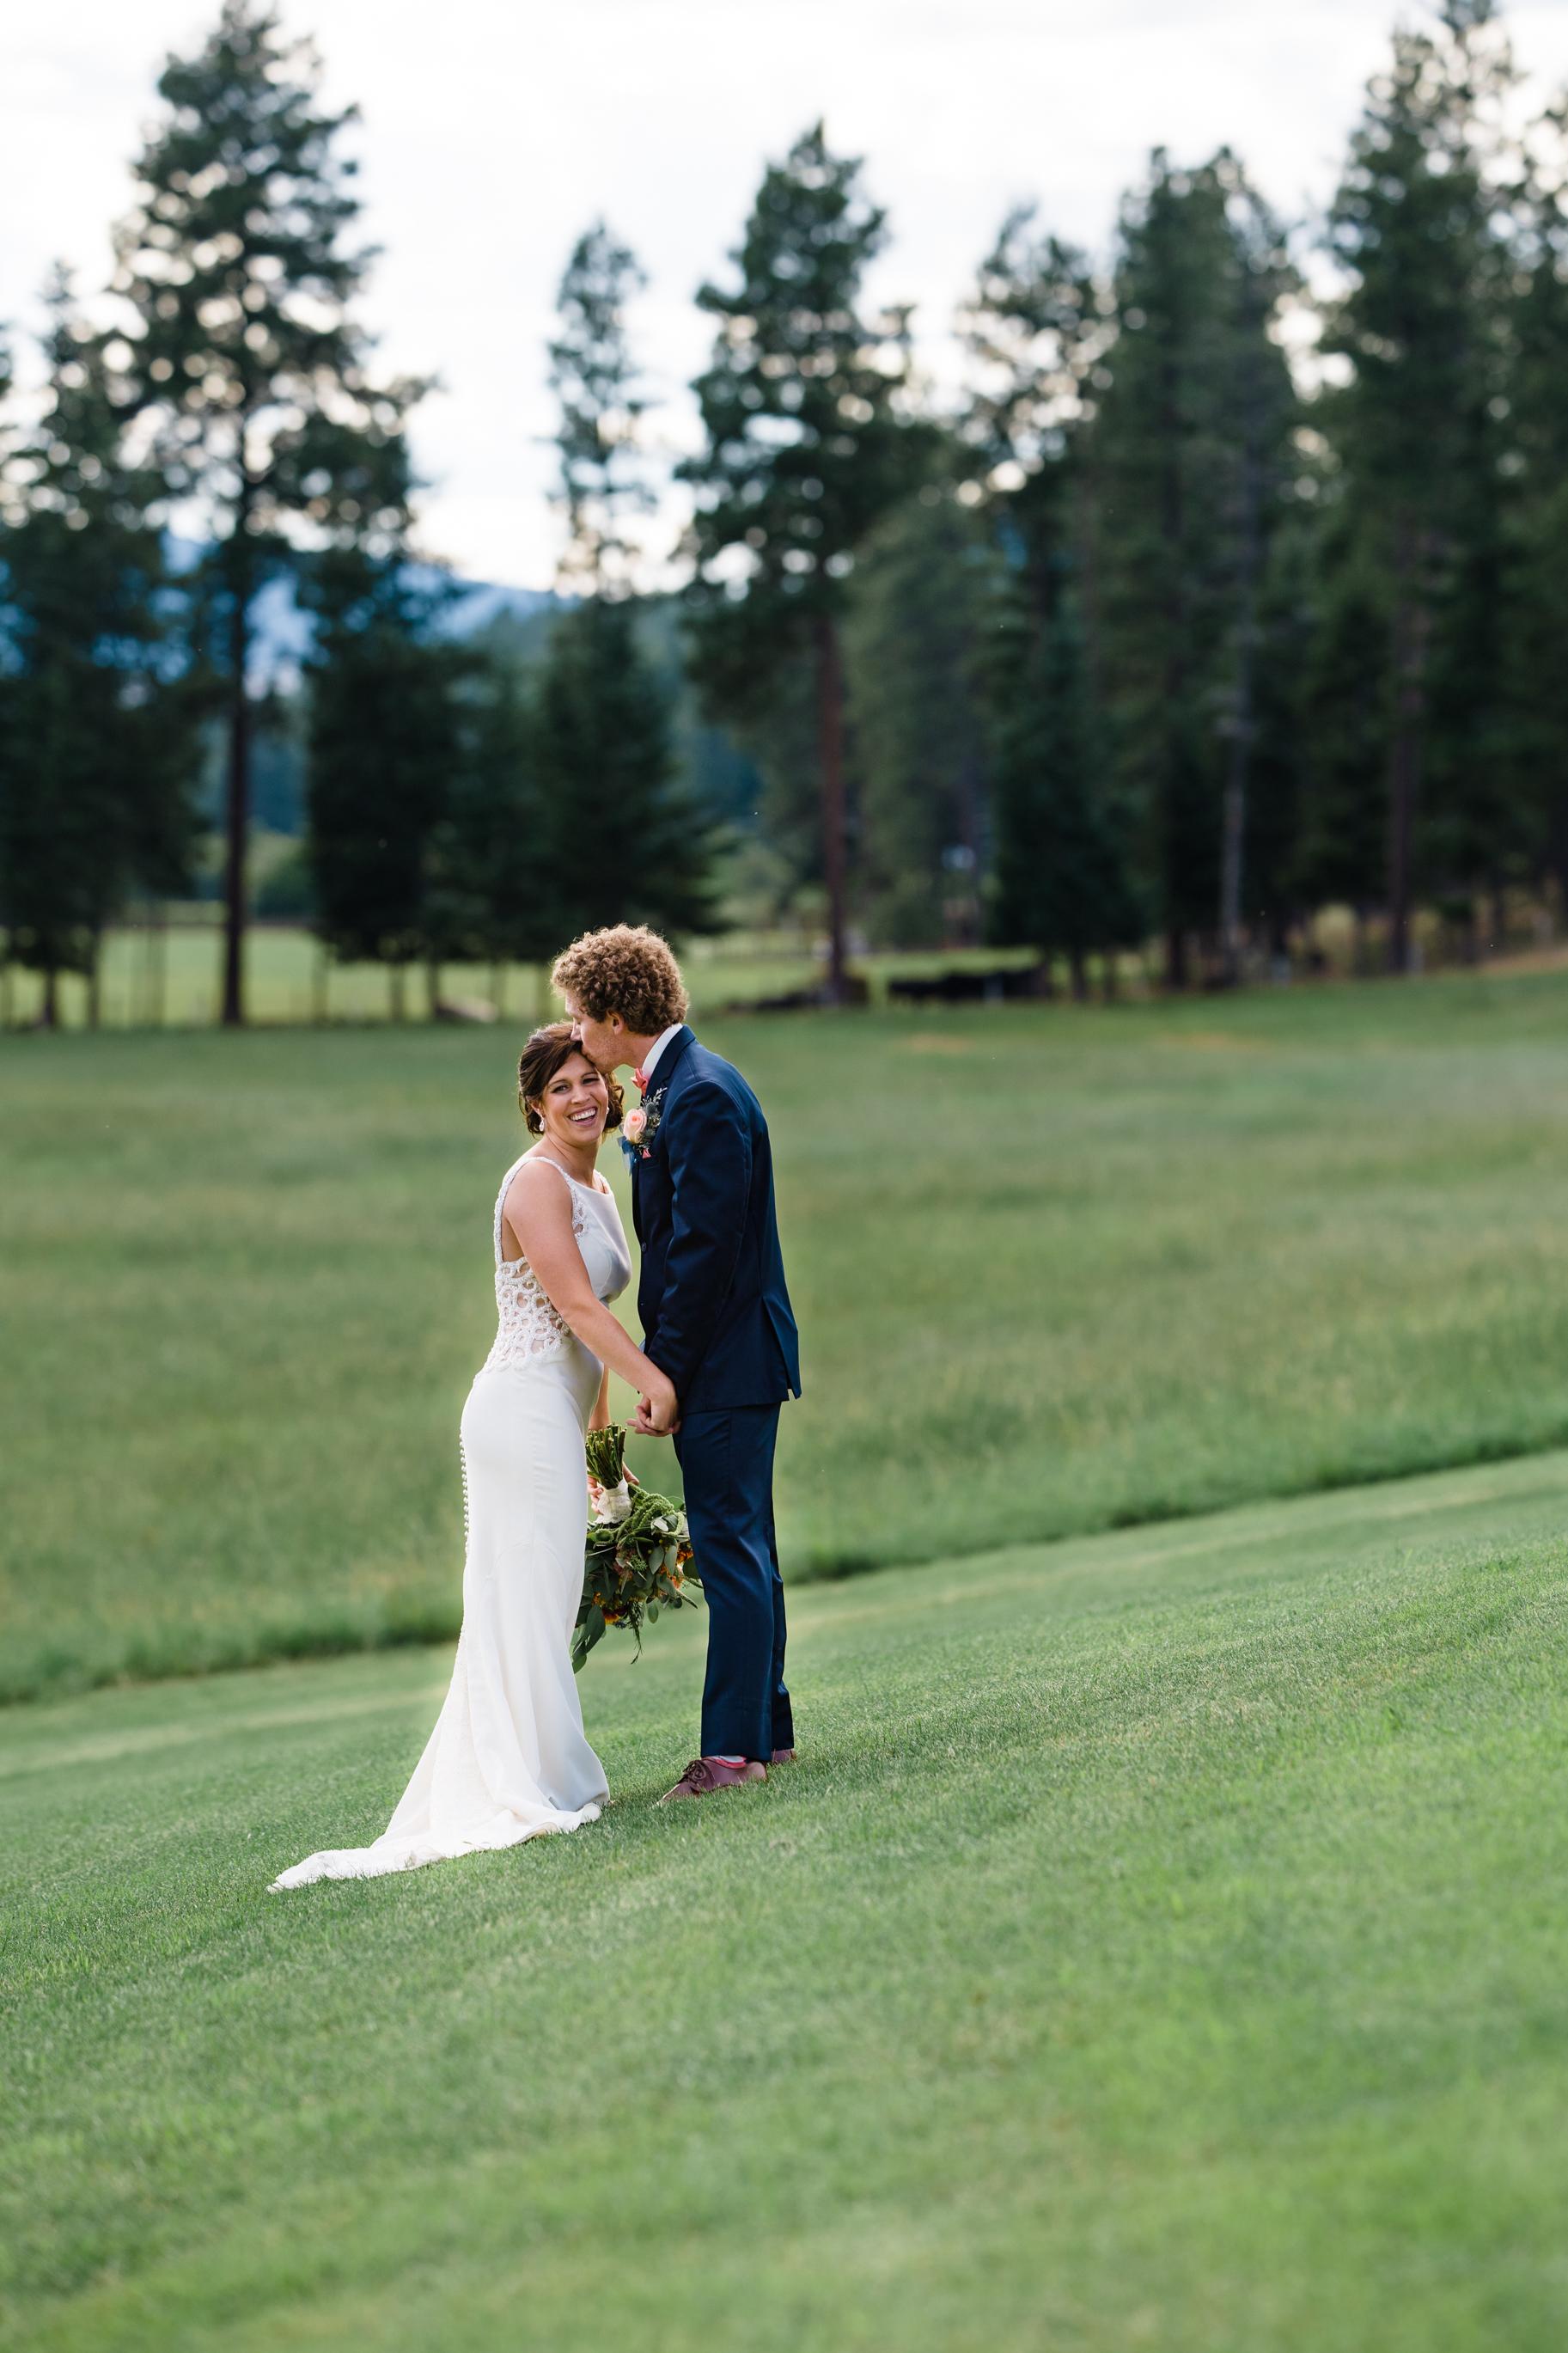 019The Barn at Finley Point Wedding_Montana Wedding Photographer_Katy & Bryce_July 20, 2019-465.jpg